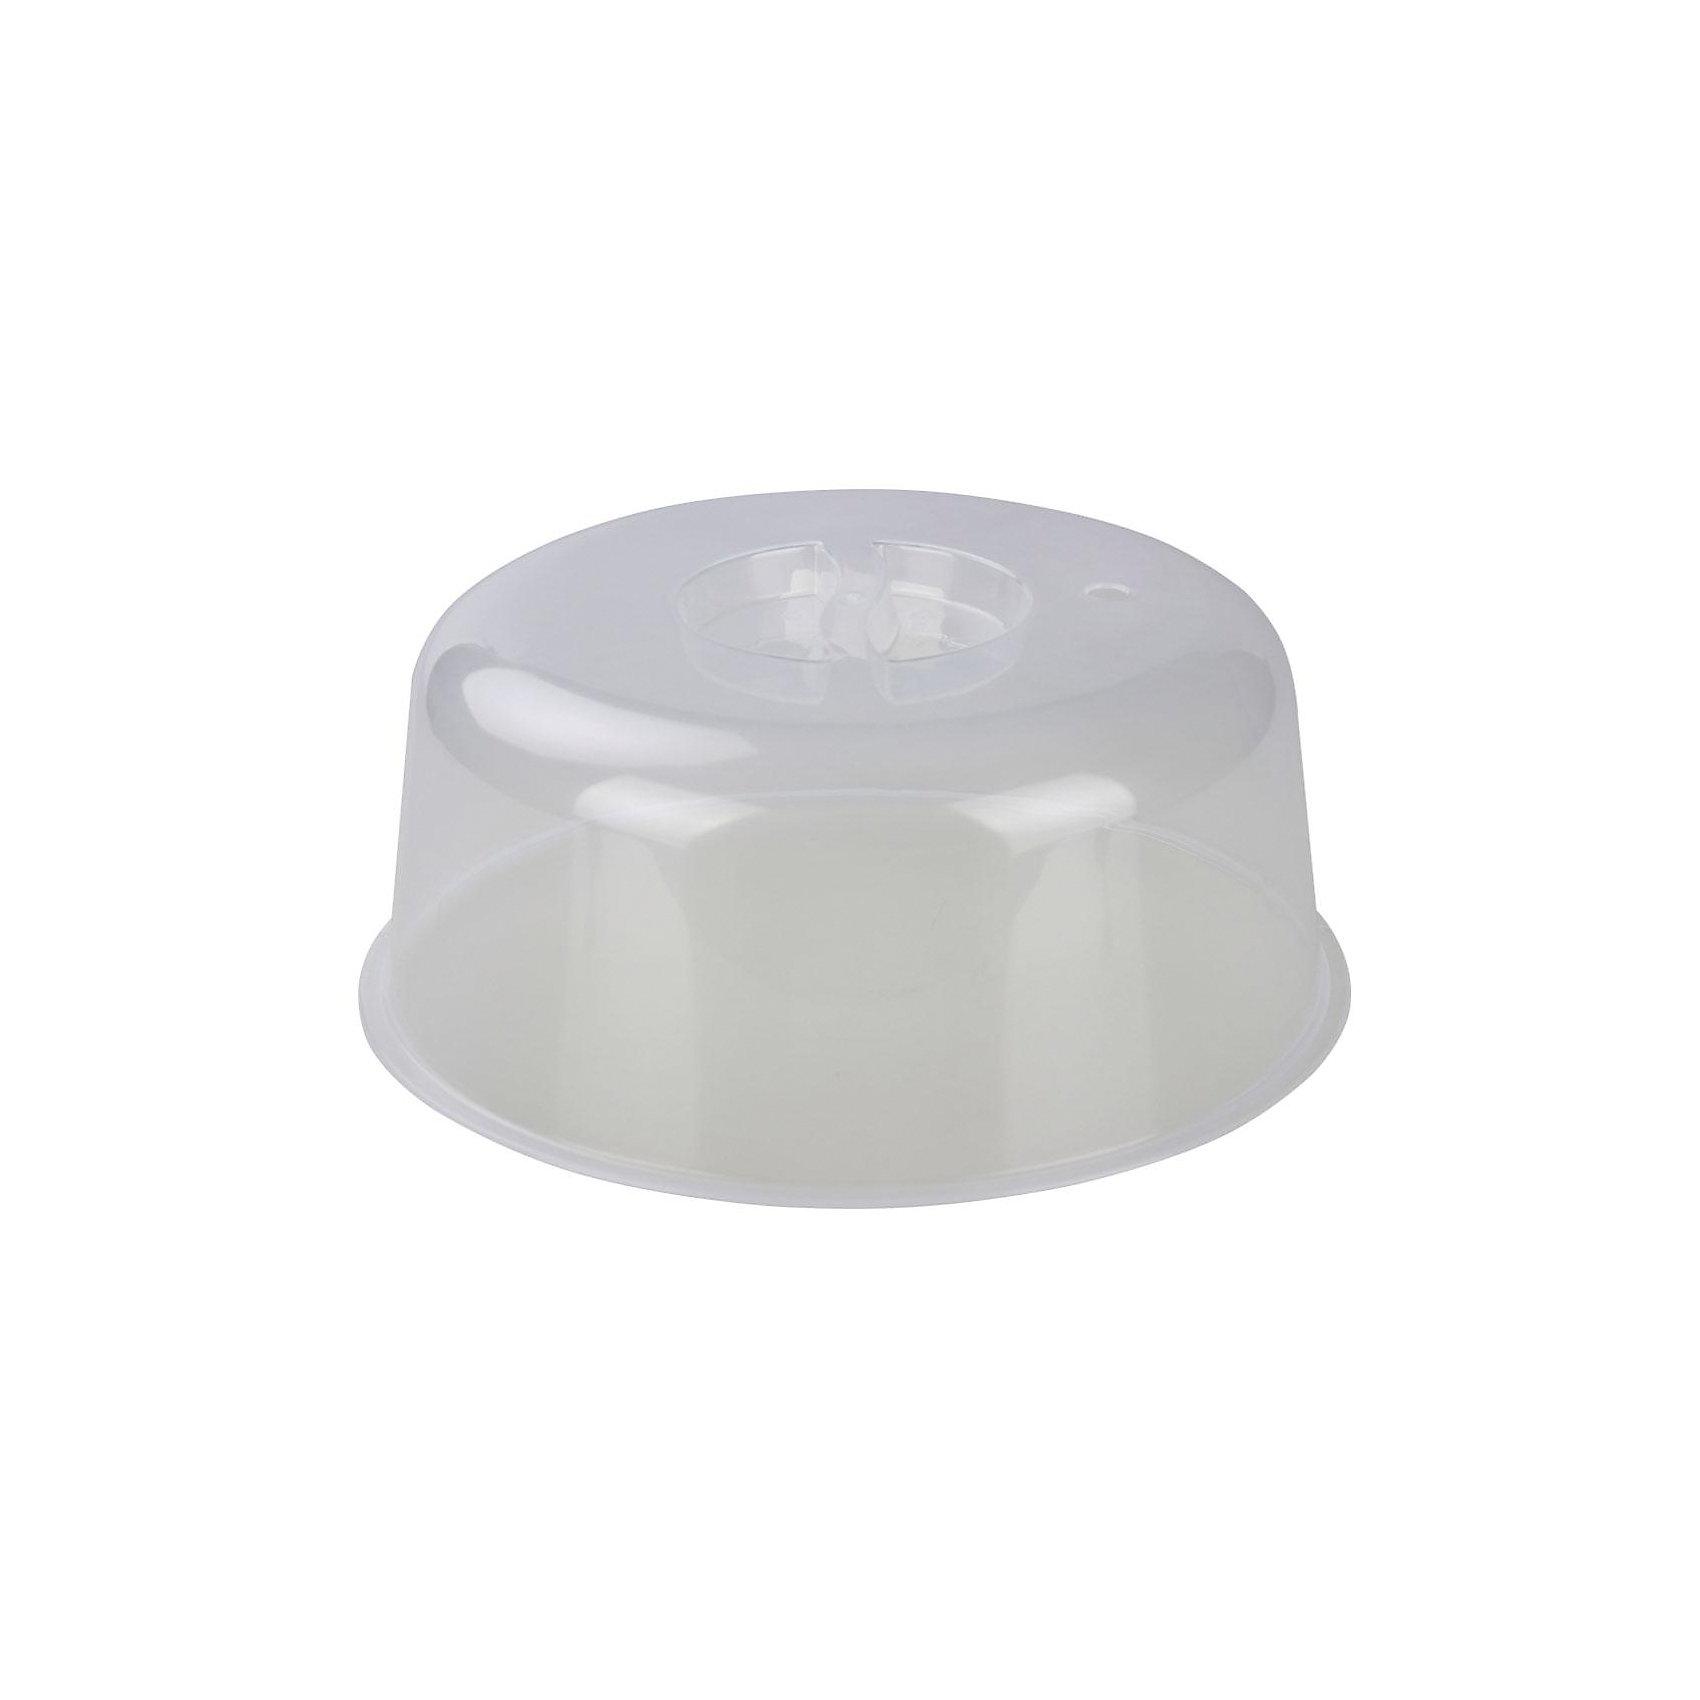 Alternativa Крышка для СВЧ Смак  (диам. 250мм), Alternativa alternativa горка для купания alternativa розовый